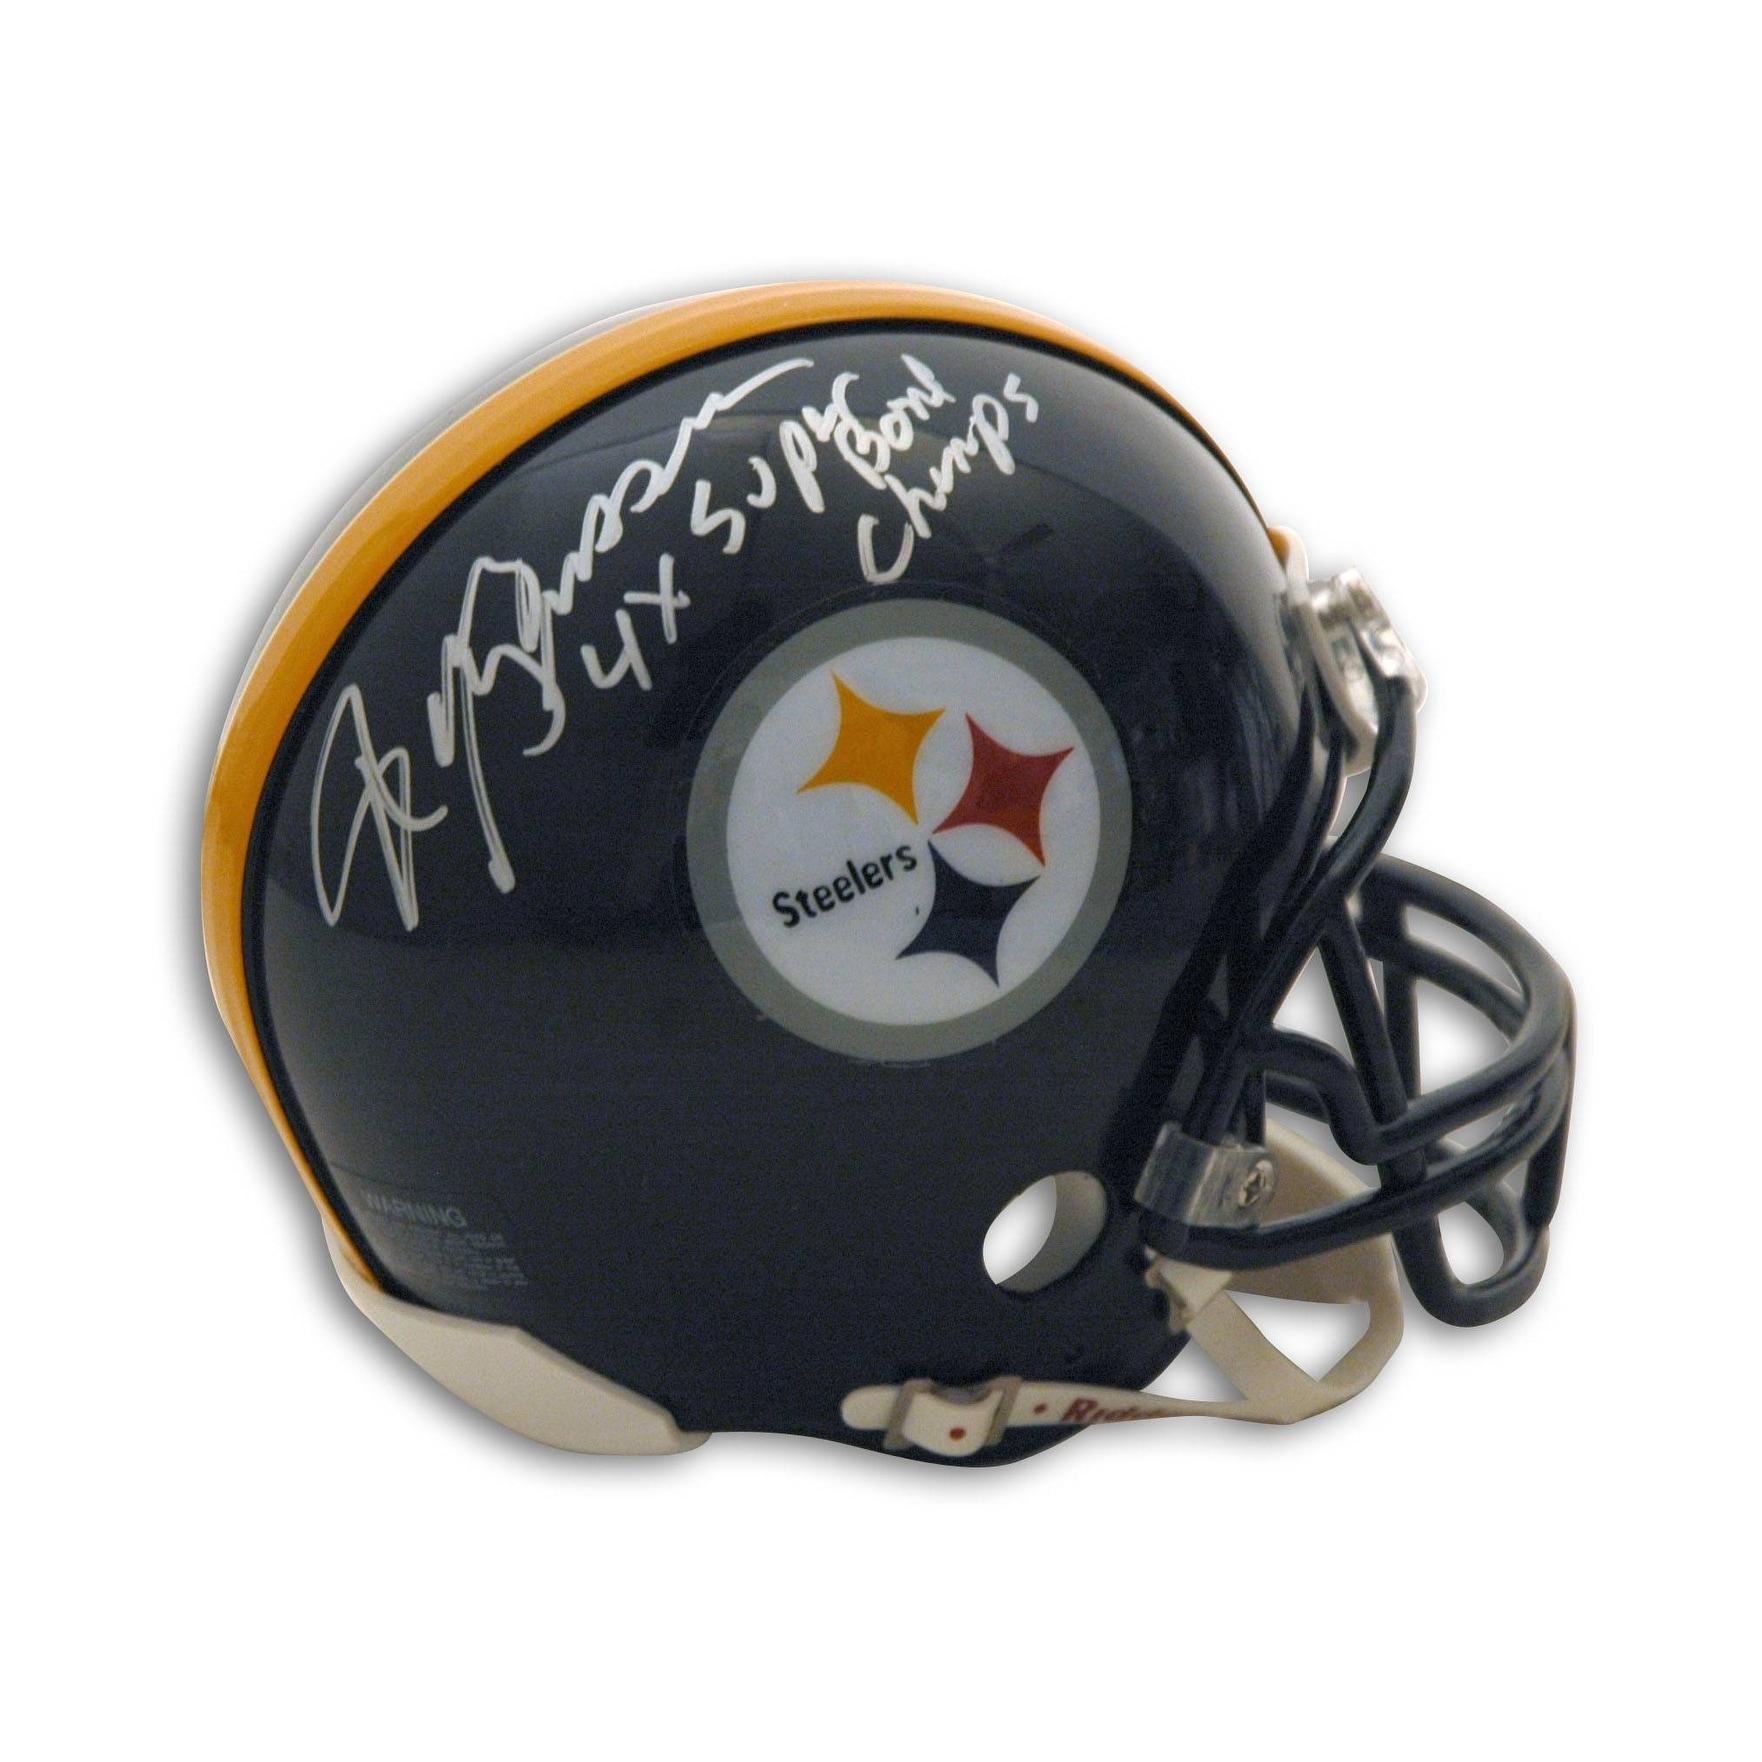 250aa8f682b Shop Randy Grossman Pittsburgh Steelers Autographed Mini Helmet Inscribed